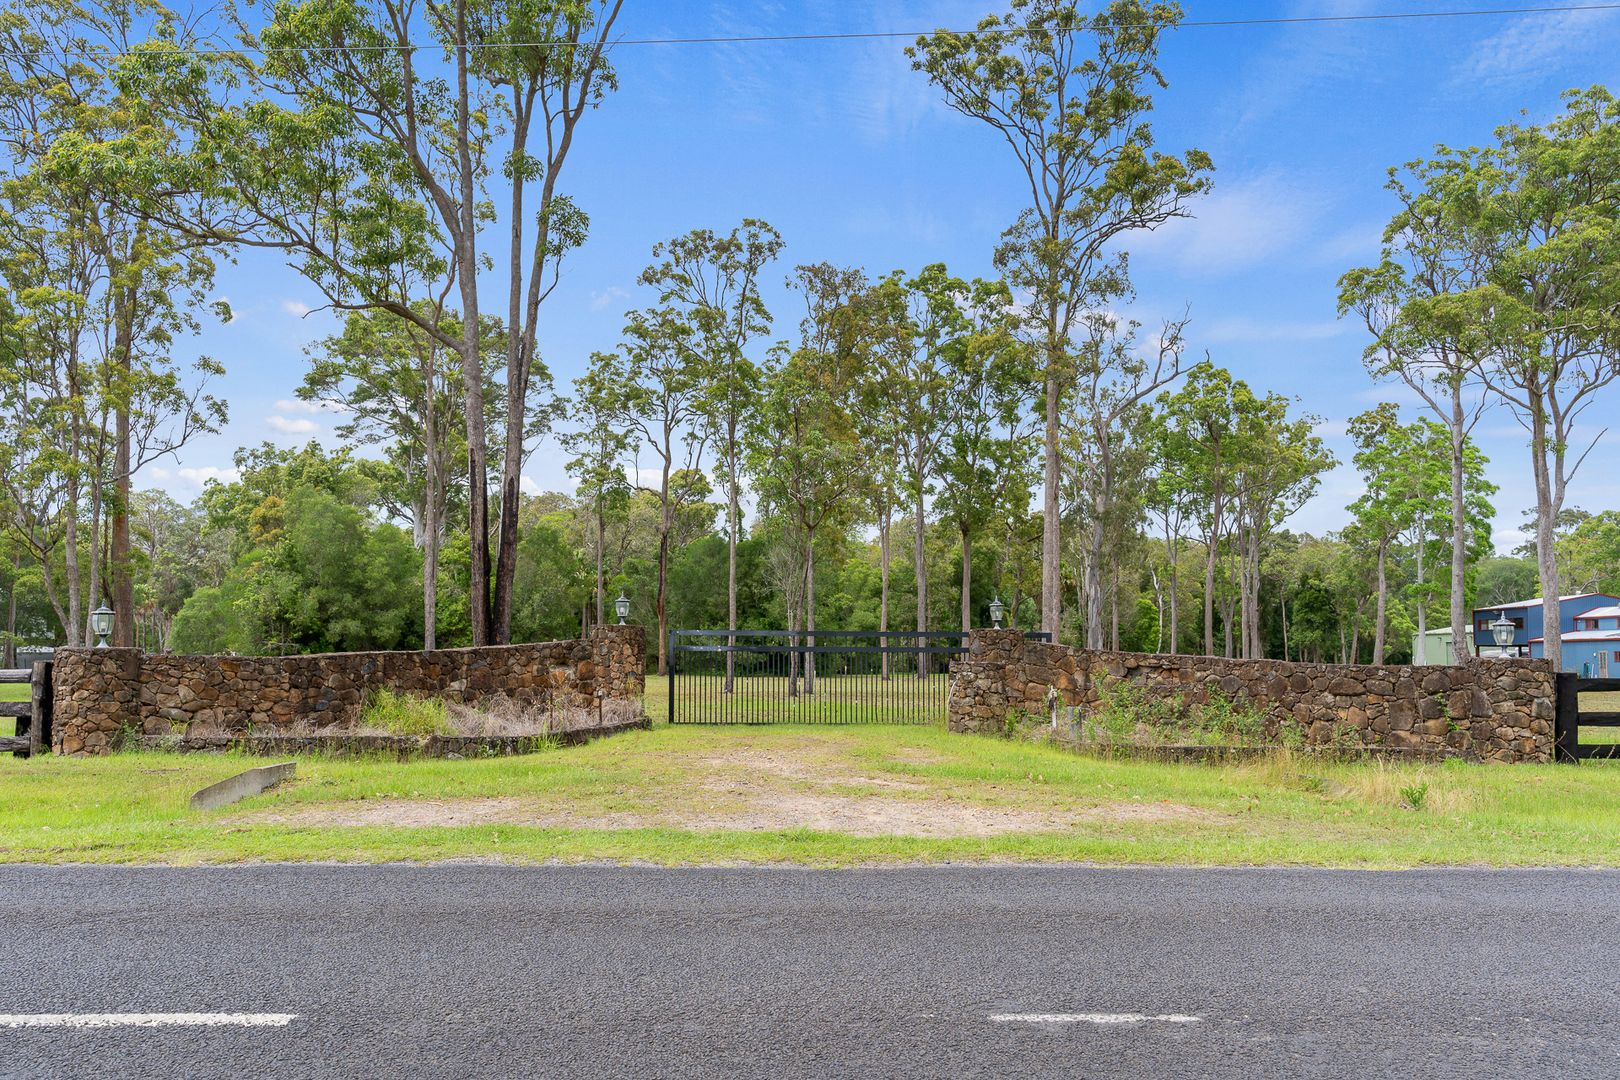 392 Woodburn - Evans Head Road, Doonbah NSW 2473, Image 2